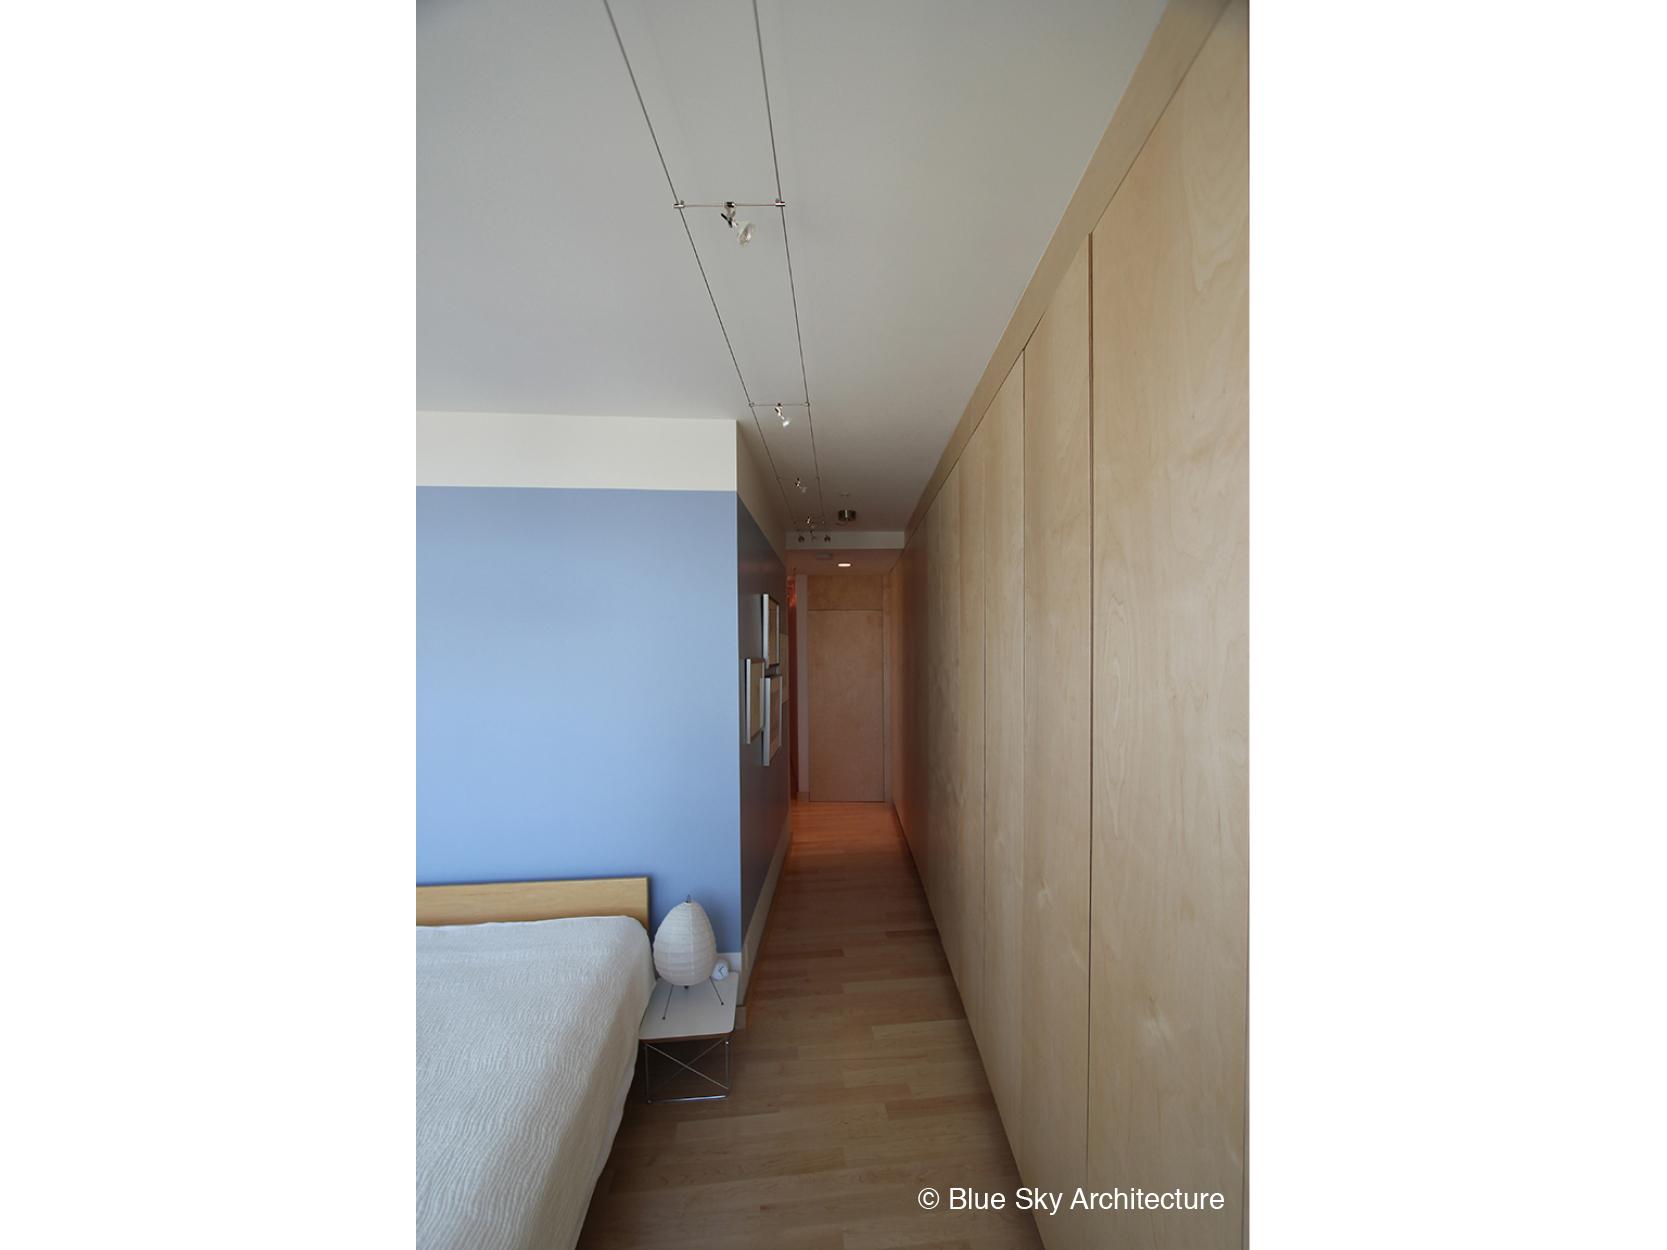 Vancouver condo small space living and storage corridor